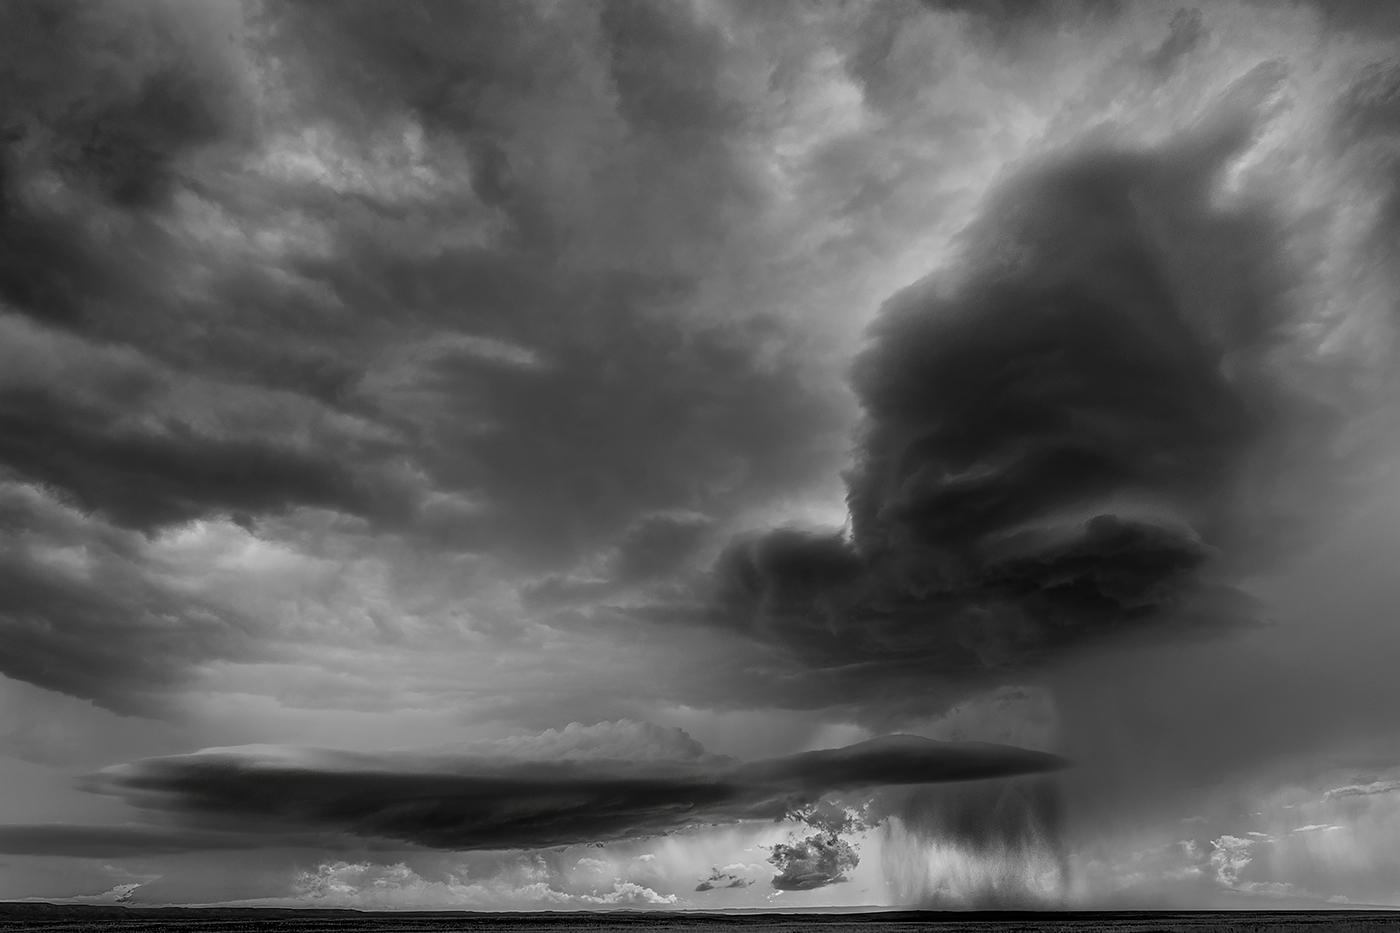 1st Place - Supercell Dropping Hail on Nebraskan Plains by Steve Carroll